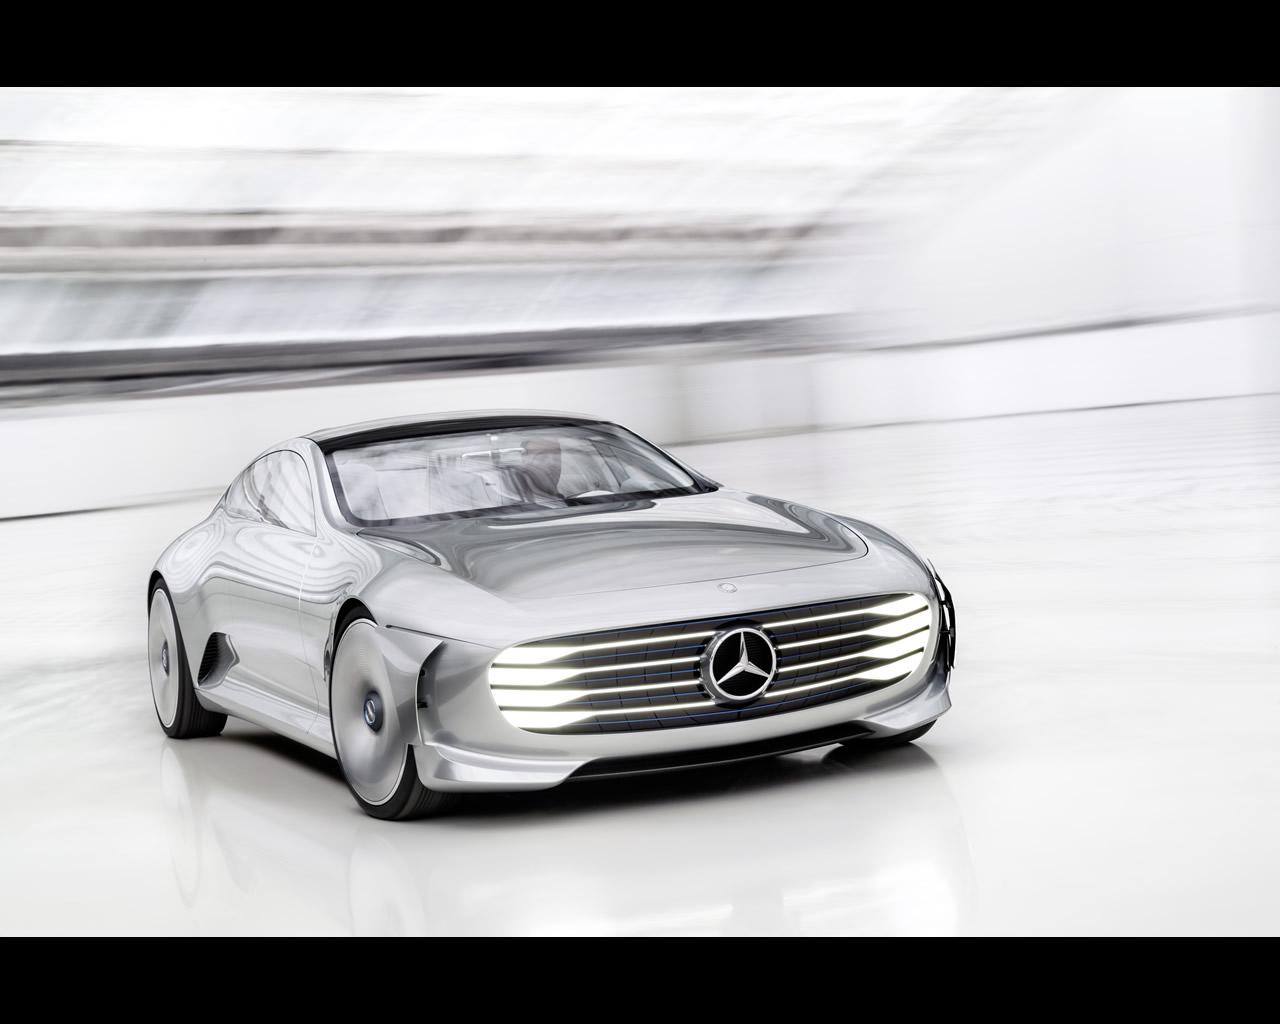 mercedes benz concept iaa 2015 intelligent aerodynamic. Black Bedroom Furniture Sets. Home Design Ideas